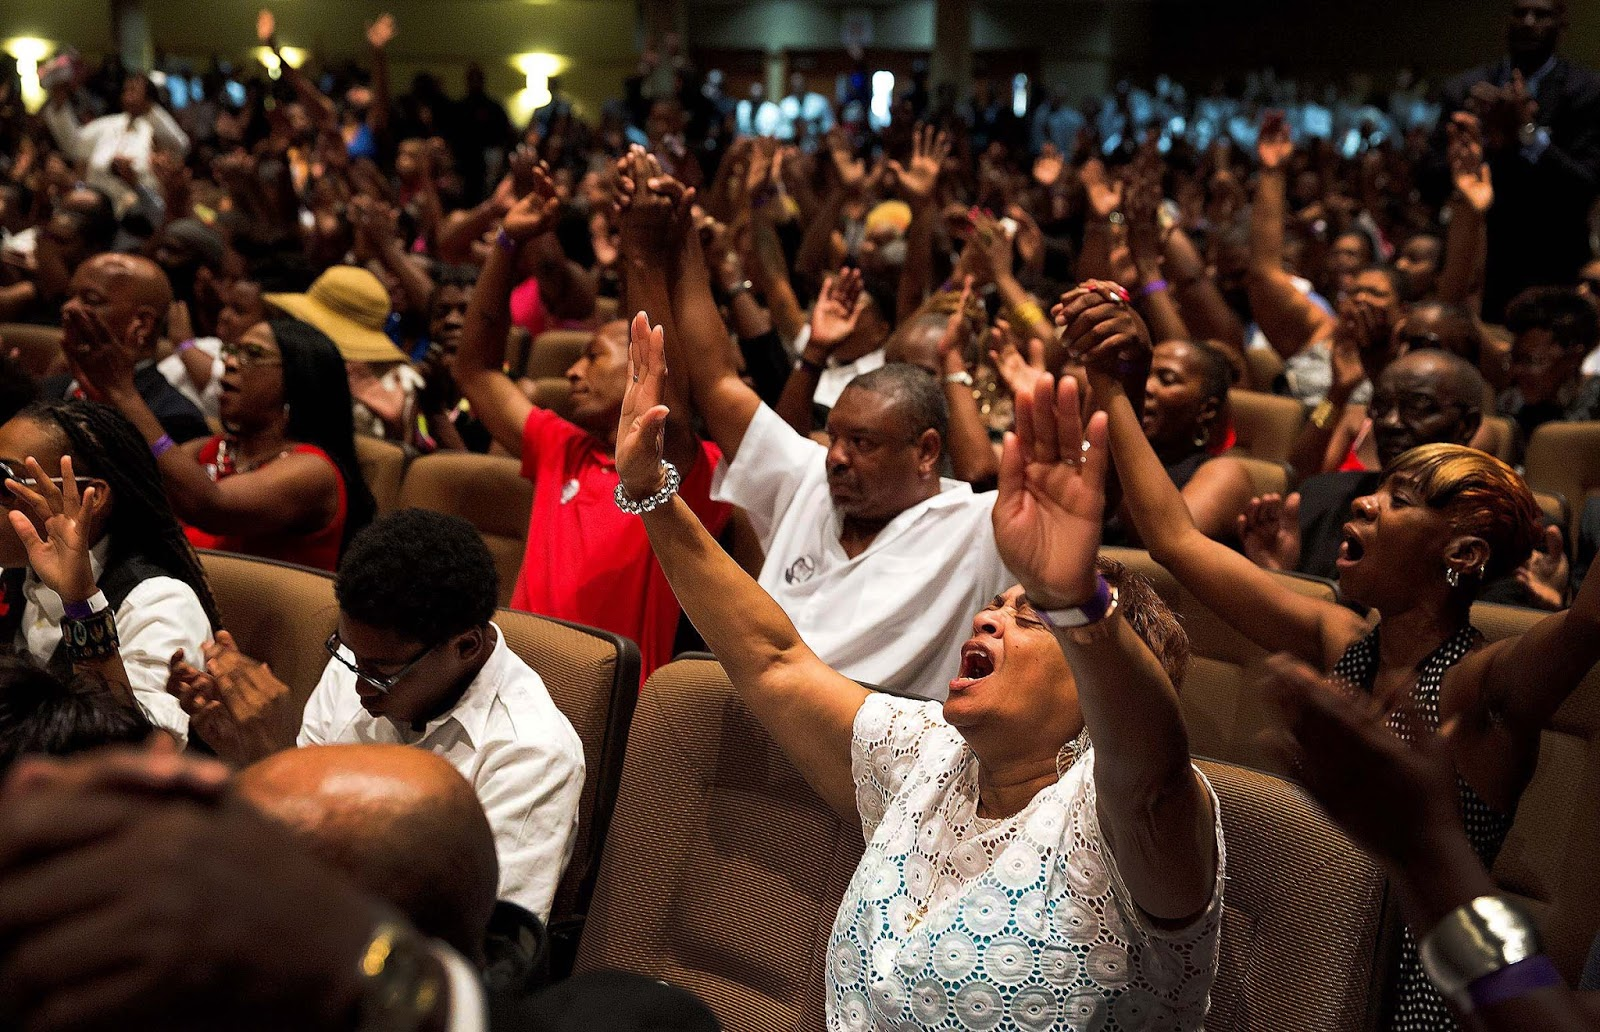 White women worshiping black cock bbc 9